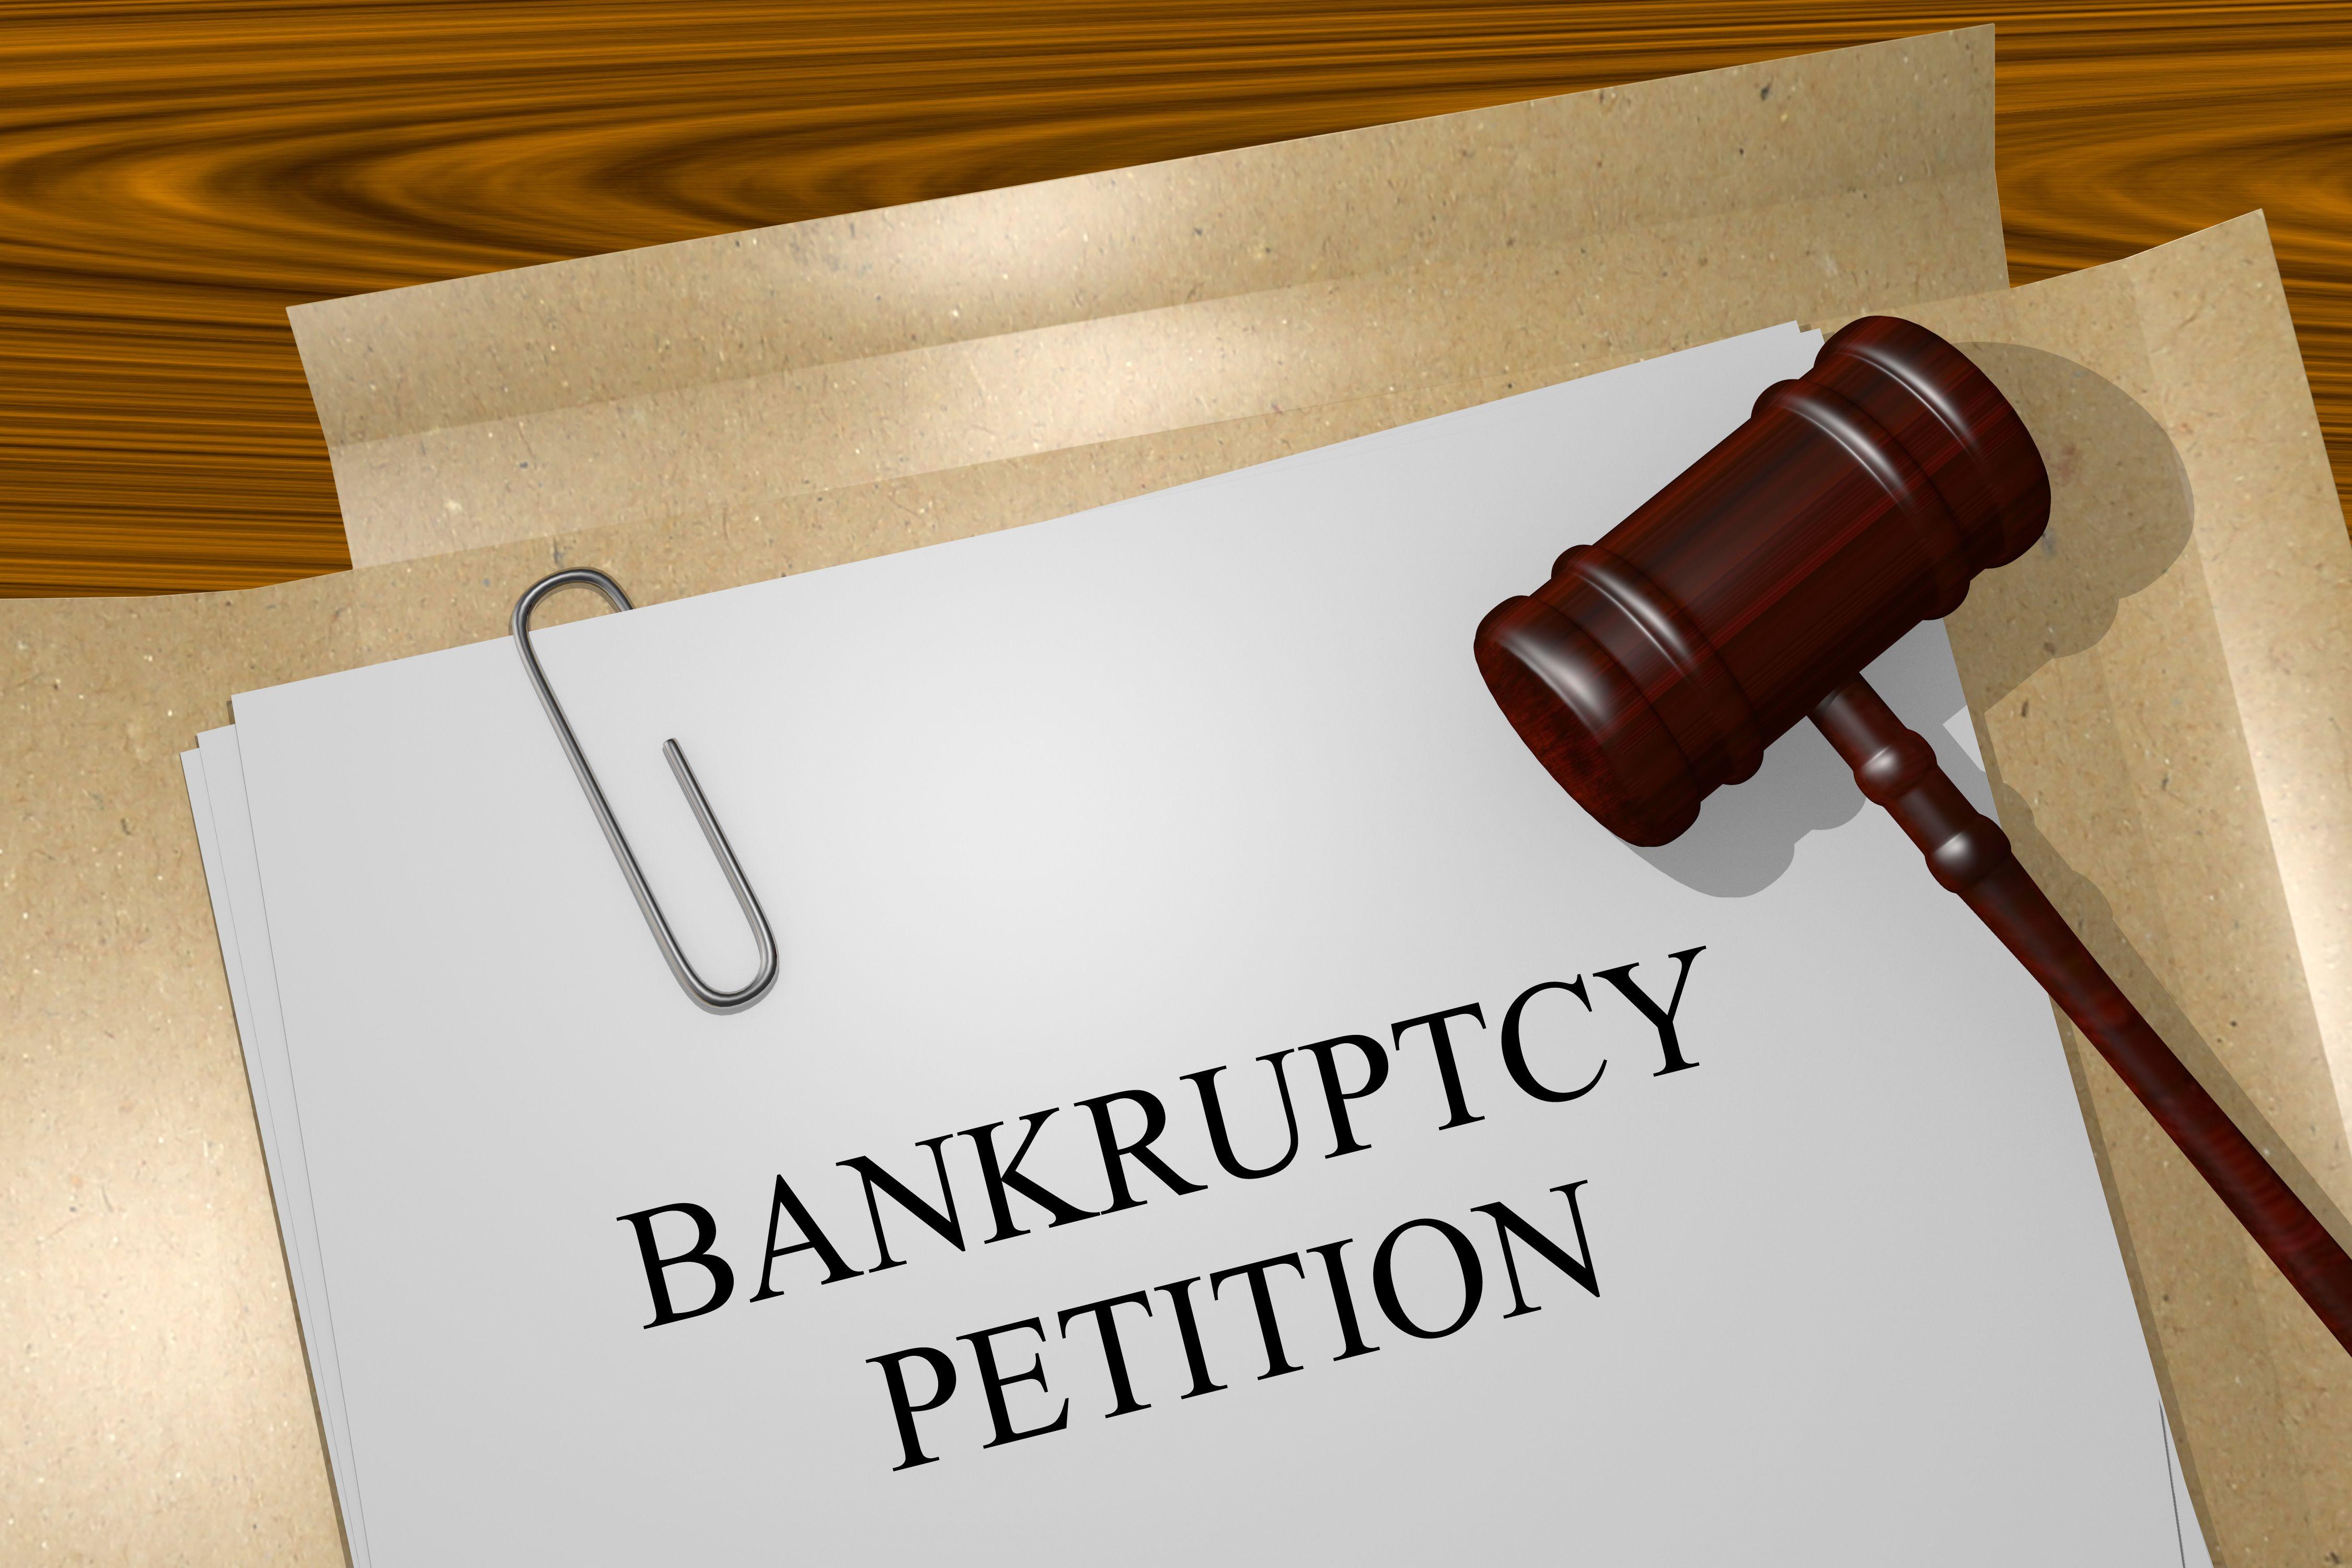 Who can make you Bankrupt?